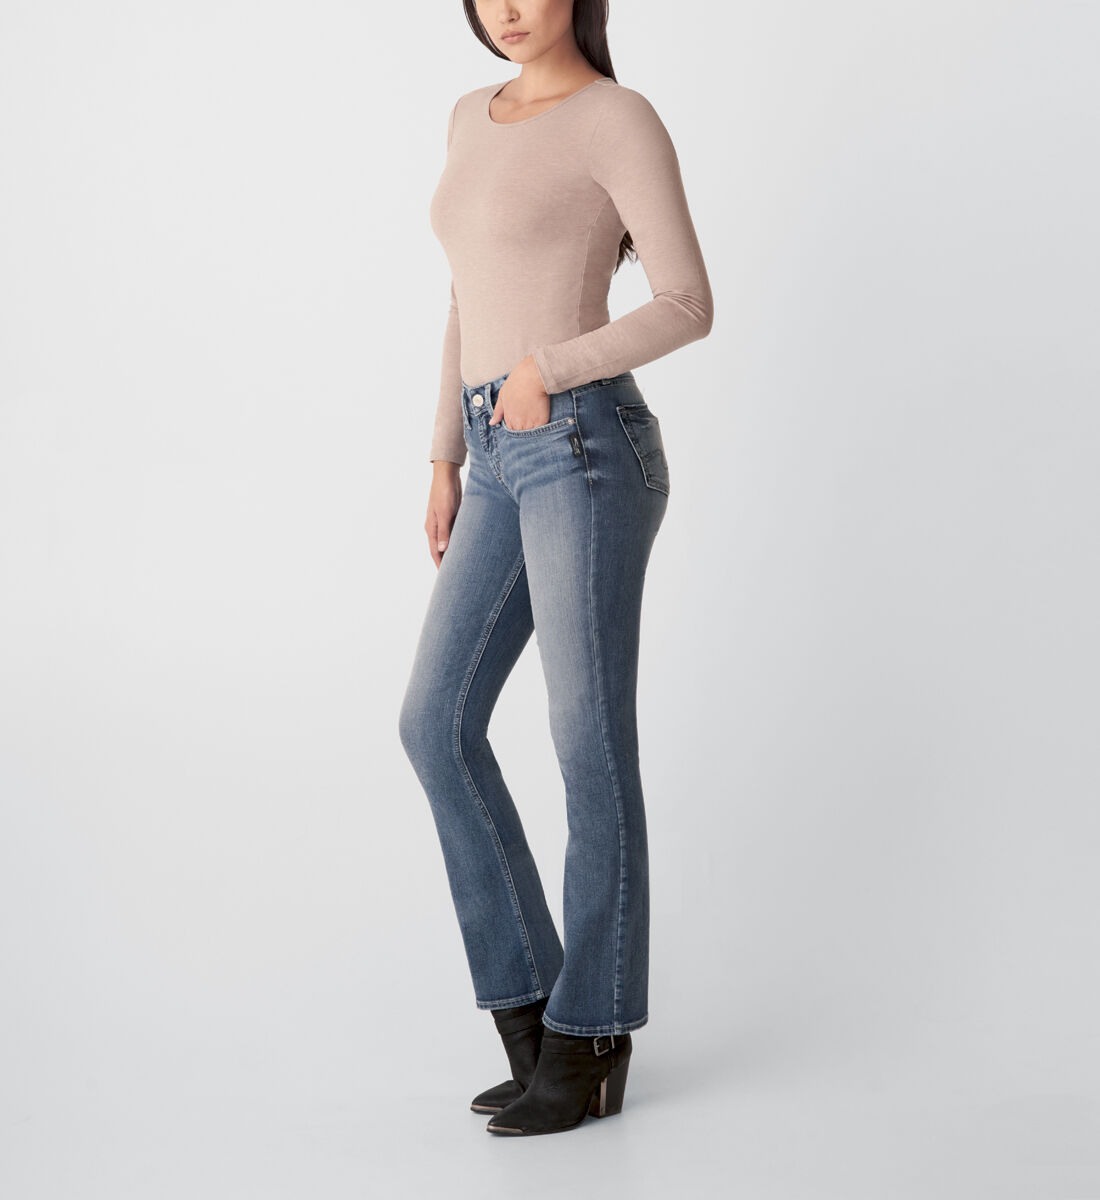 Suki Mid Rise Slim Bootcut Jeans Side